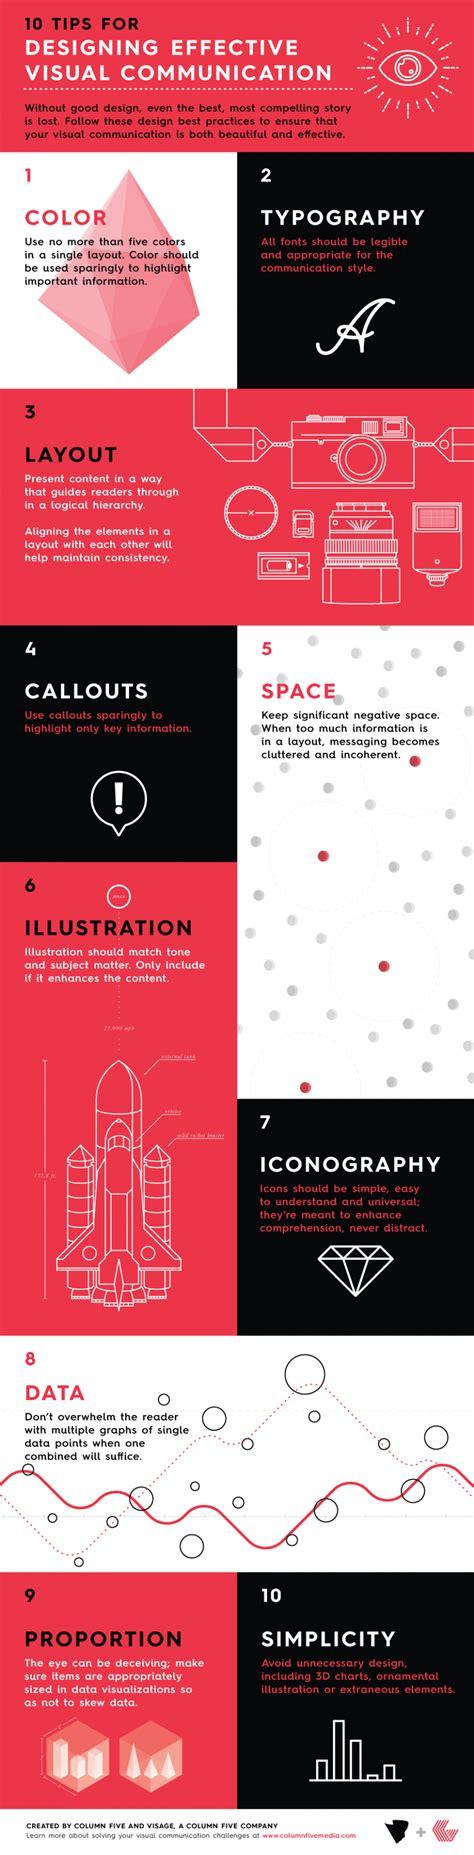 visual communication design uk infographic tips for designing effective visual